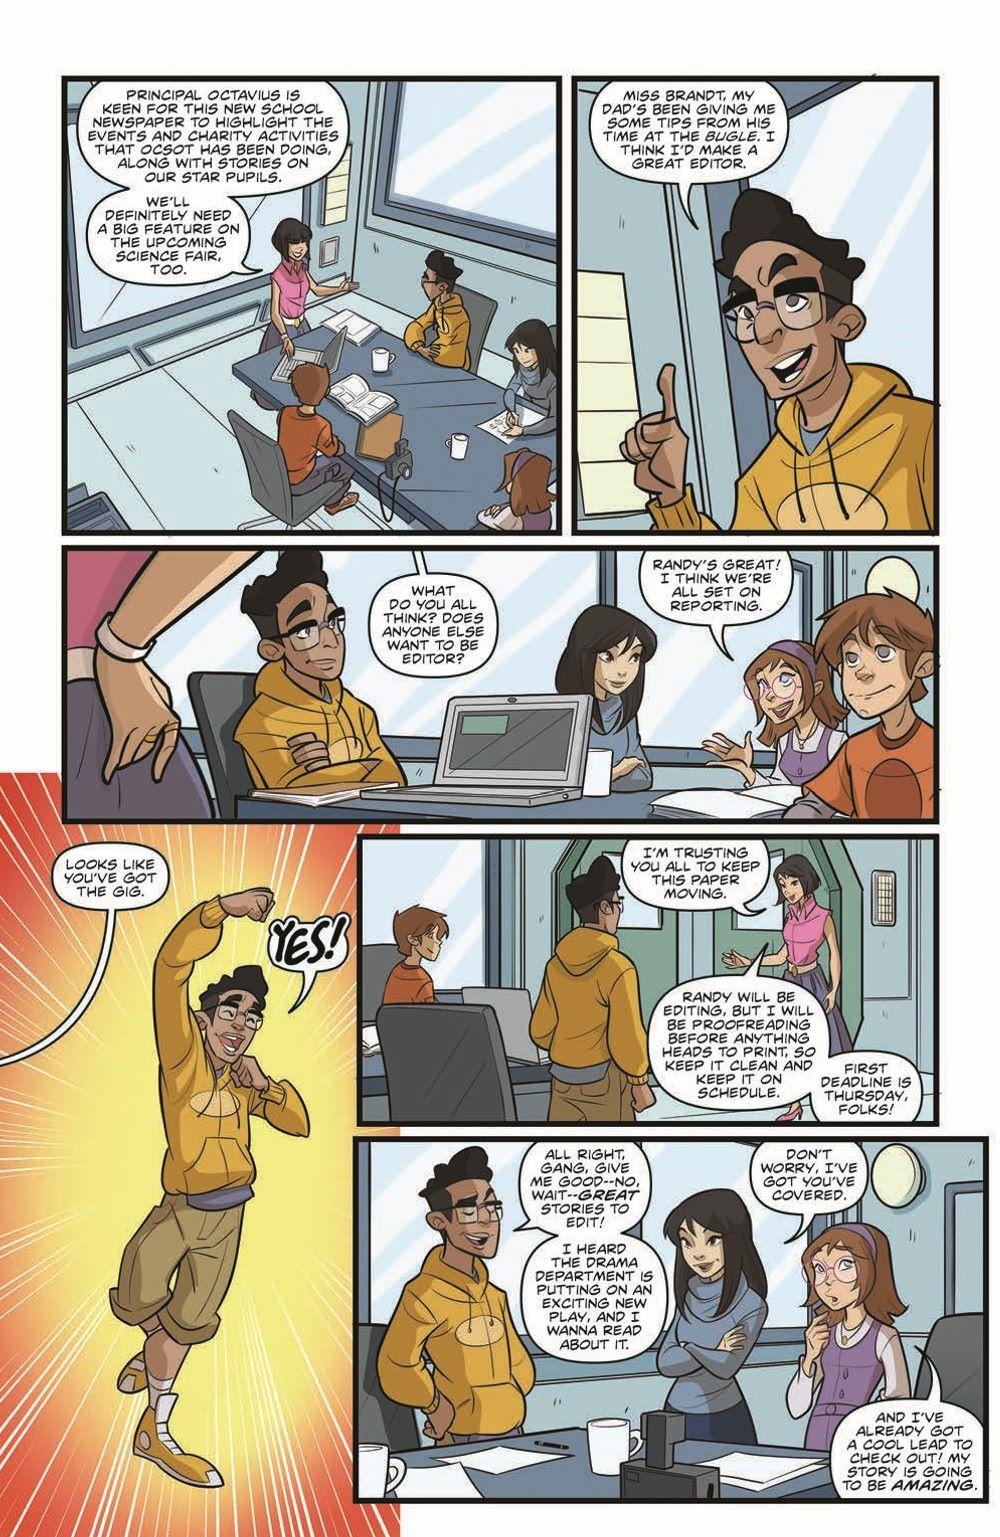 SpidermanV3-02_pr-6 ComicList Previews: MARVEL ACTION SPIDER-MAN VOLUME 3 #2